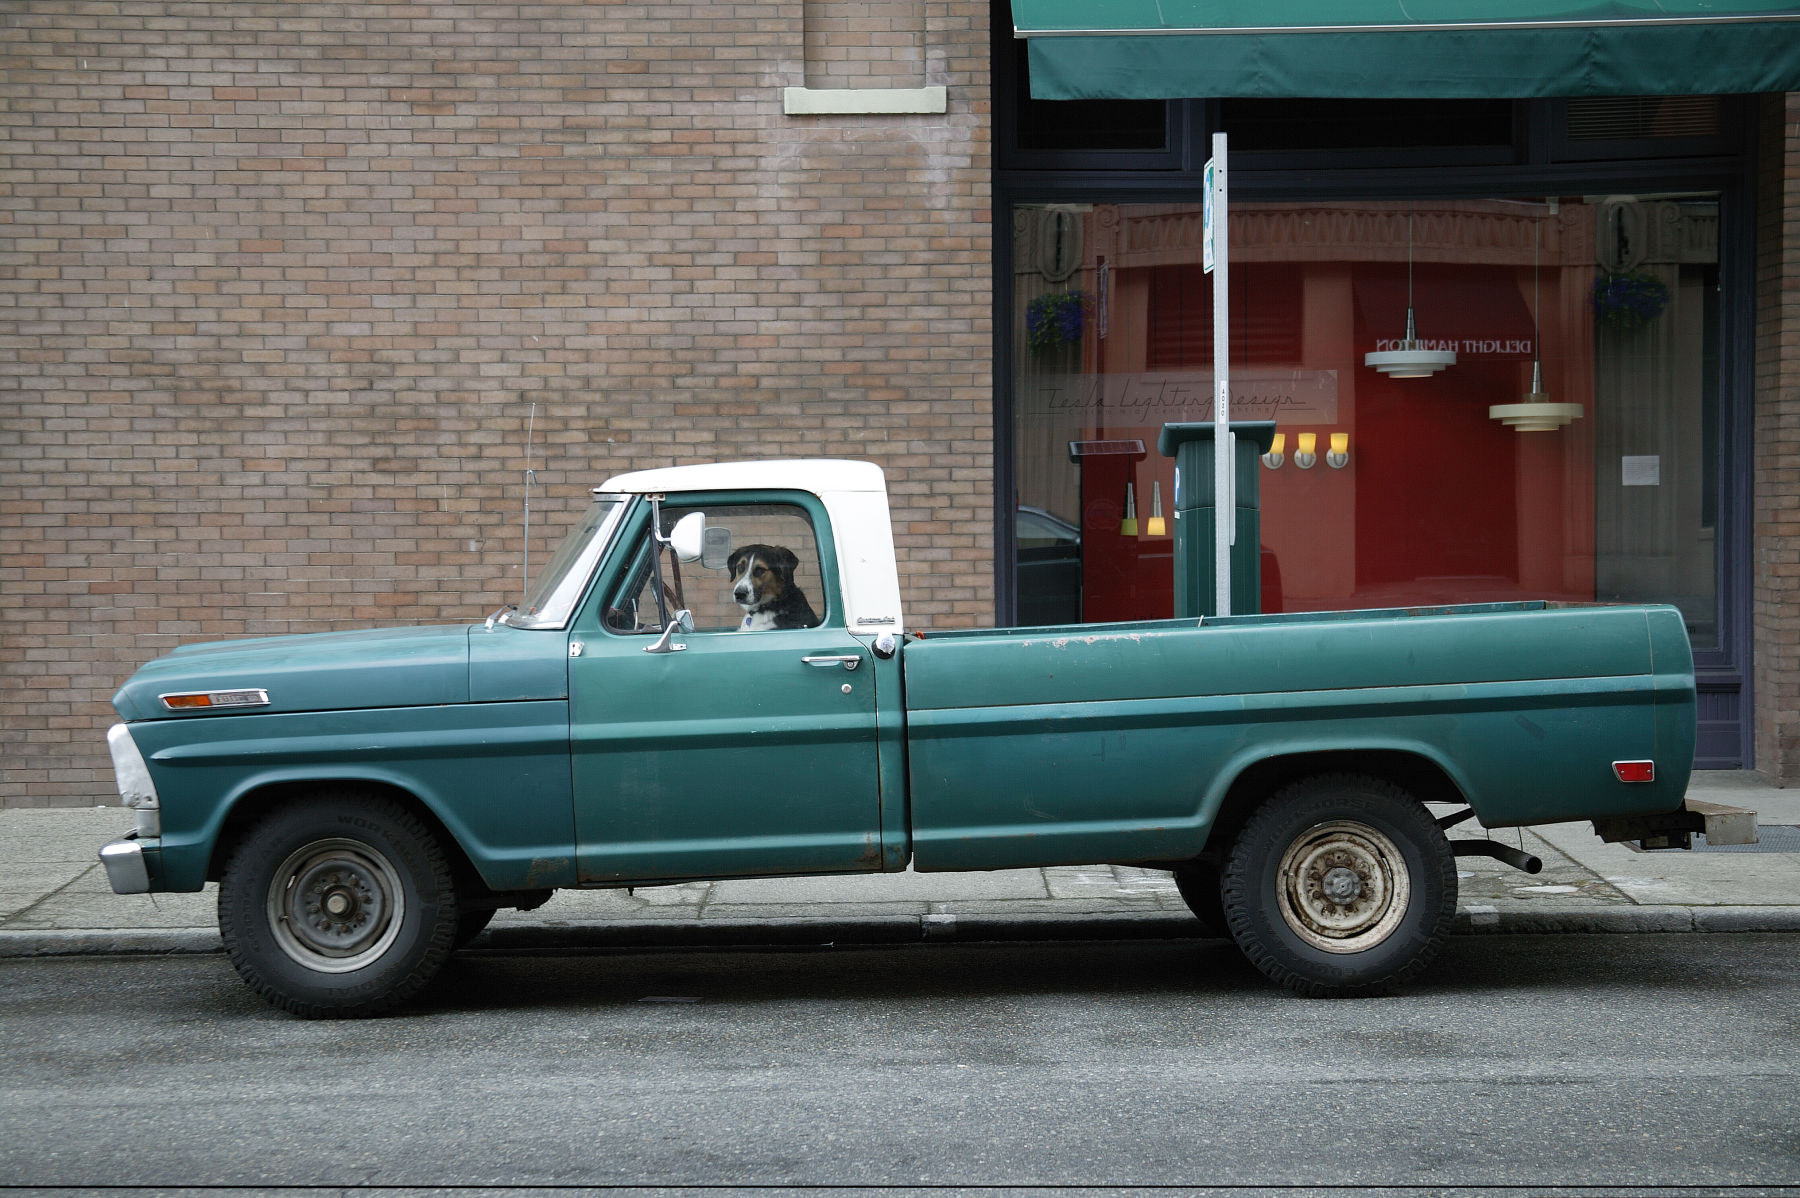 1dog_his_truck.jpg